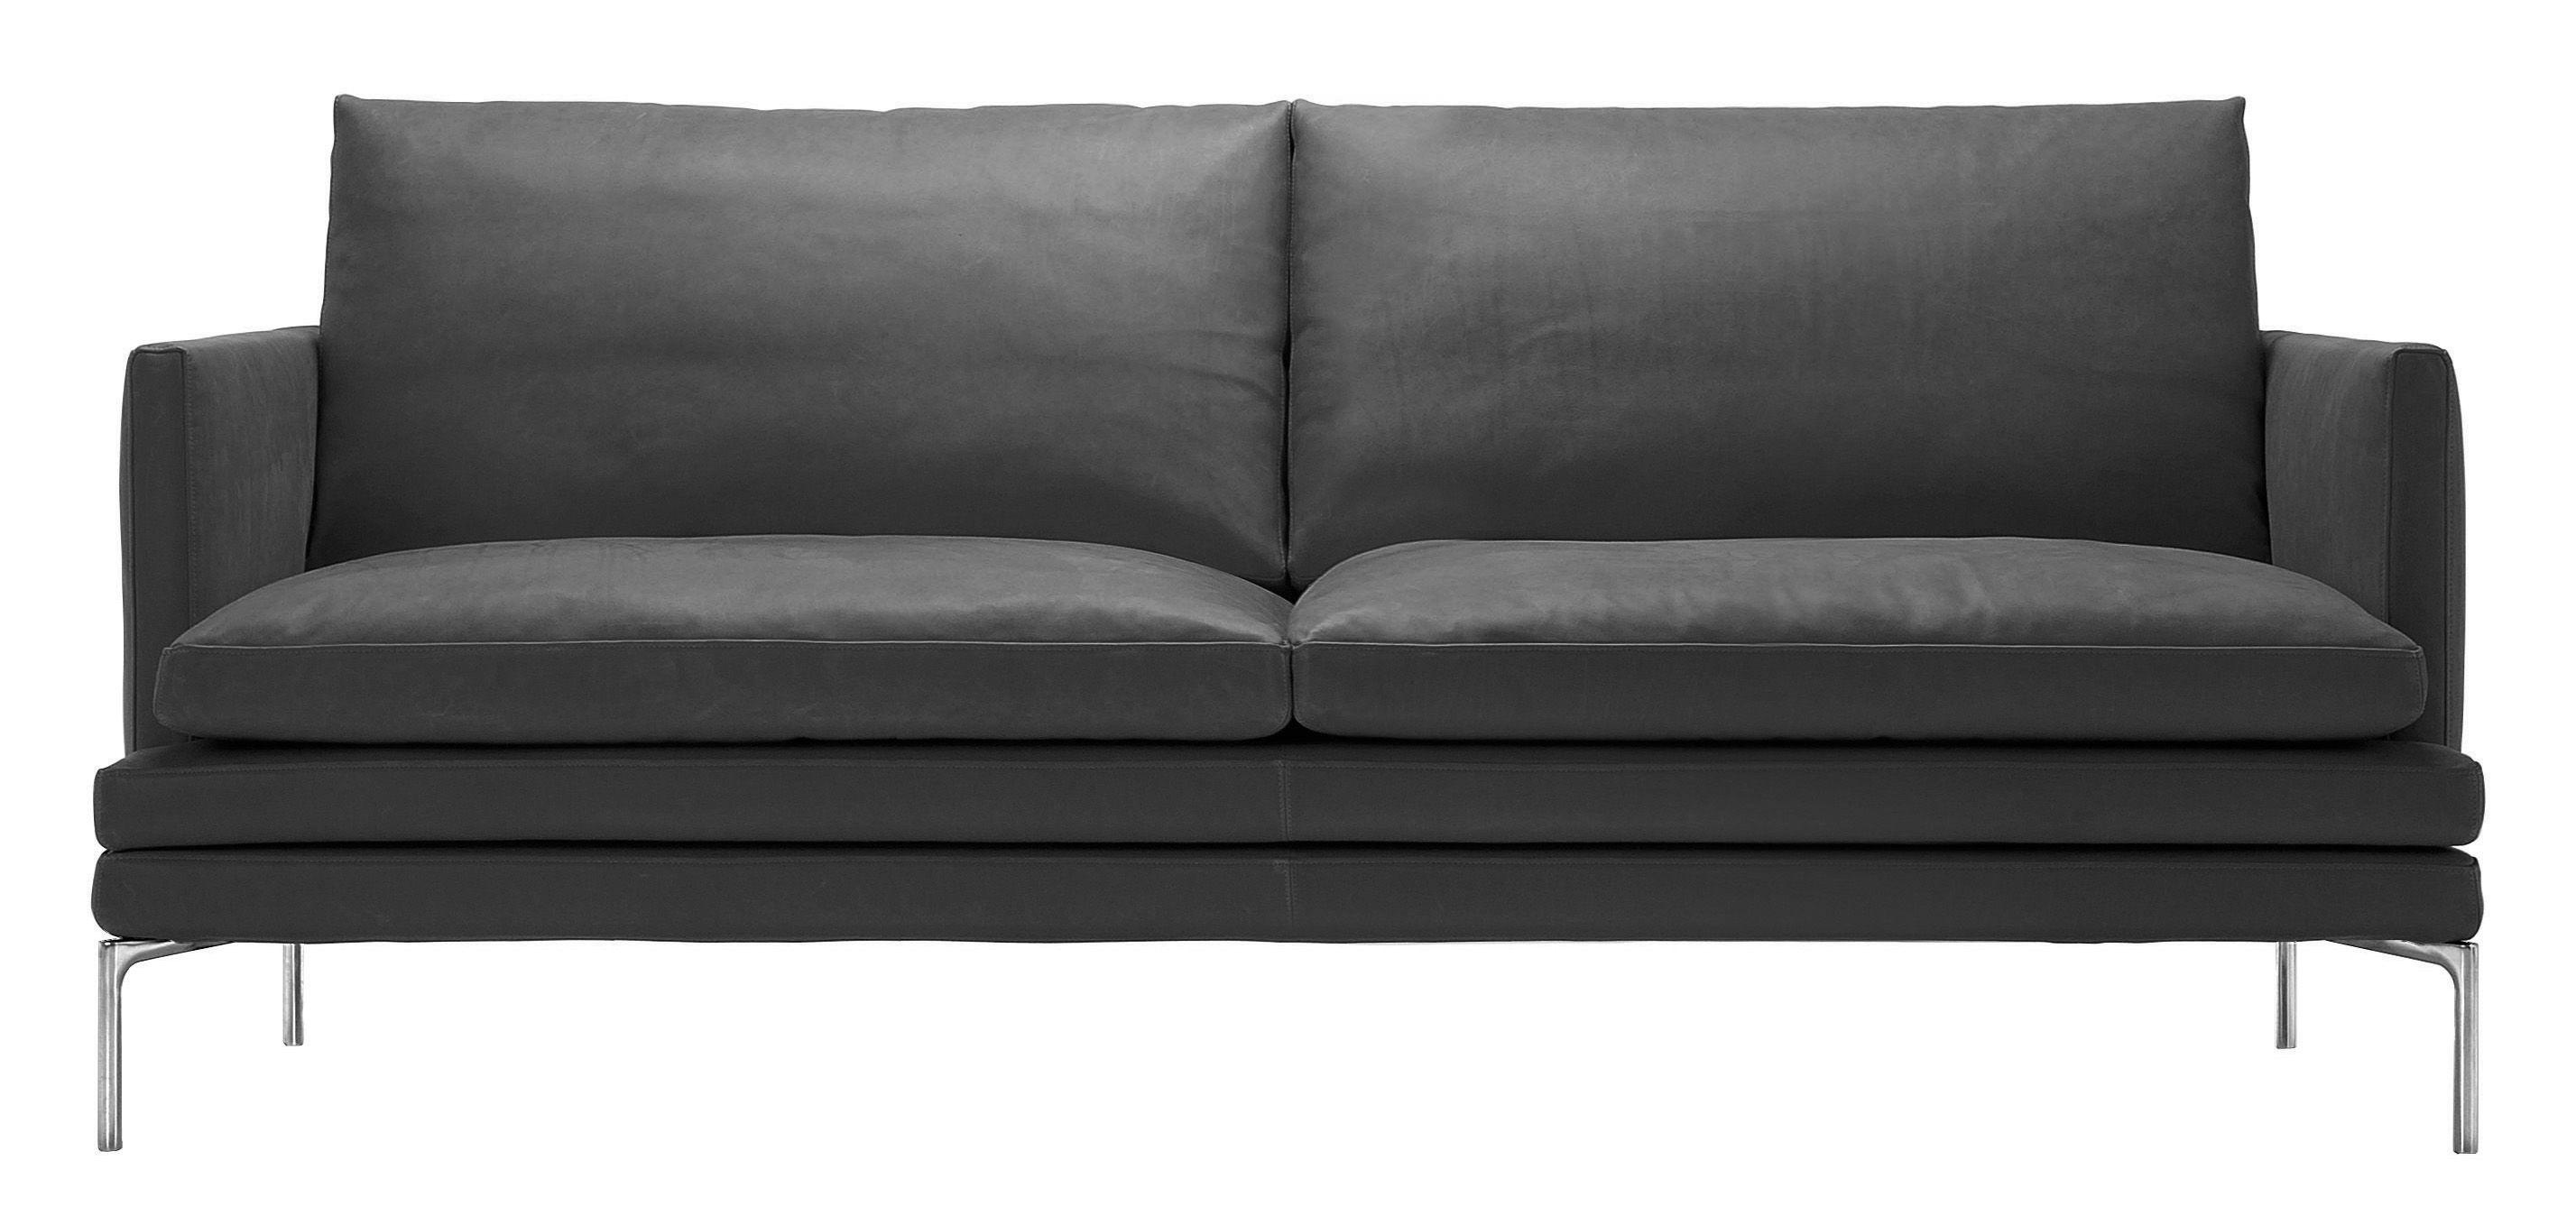 canap droit william tissu 2 places l 180 cm gris anthracite zanotta. Black Bedroom Furniture Sets. Home Design Ideas